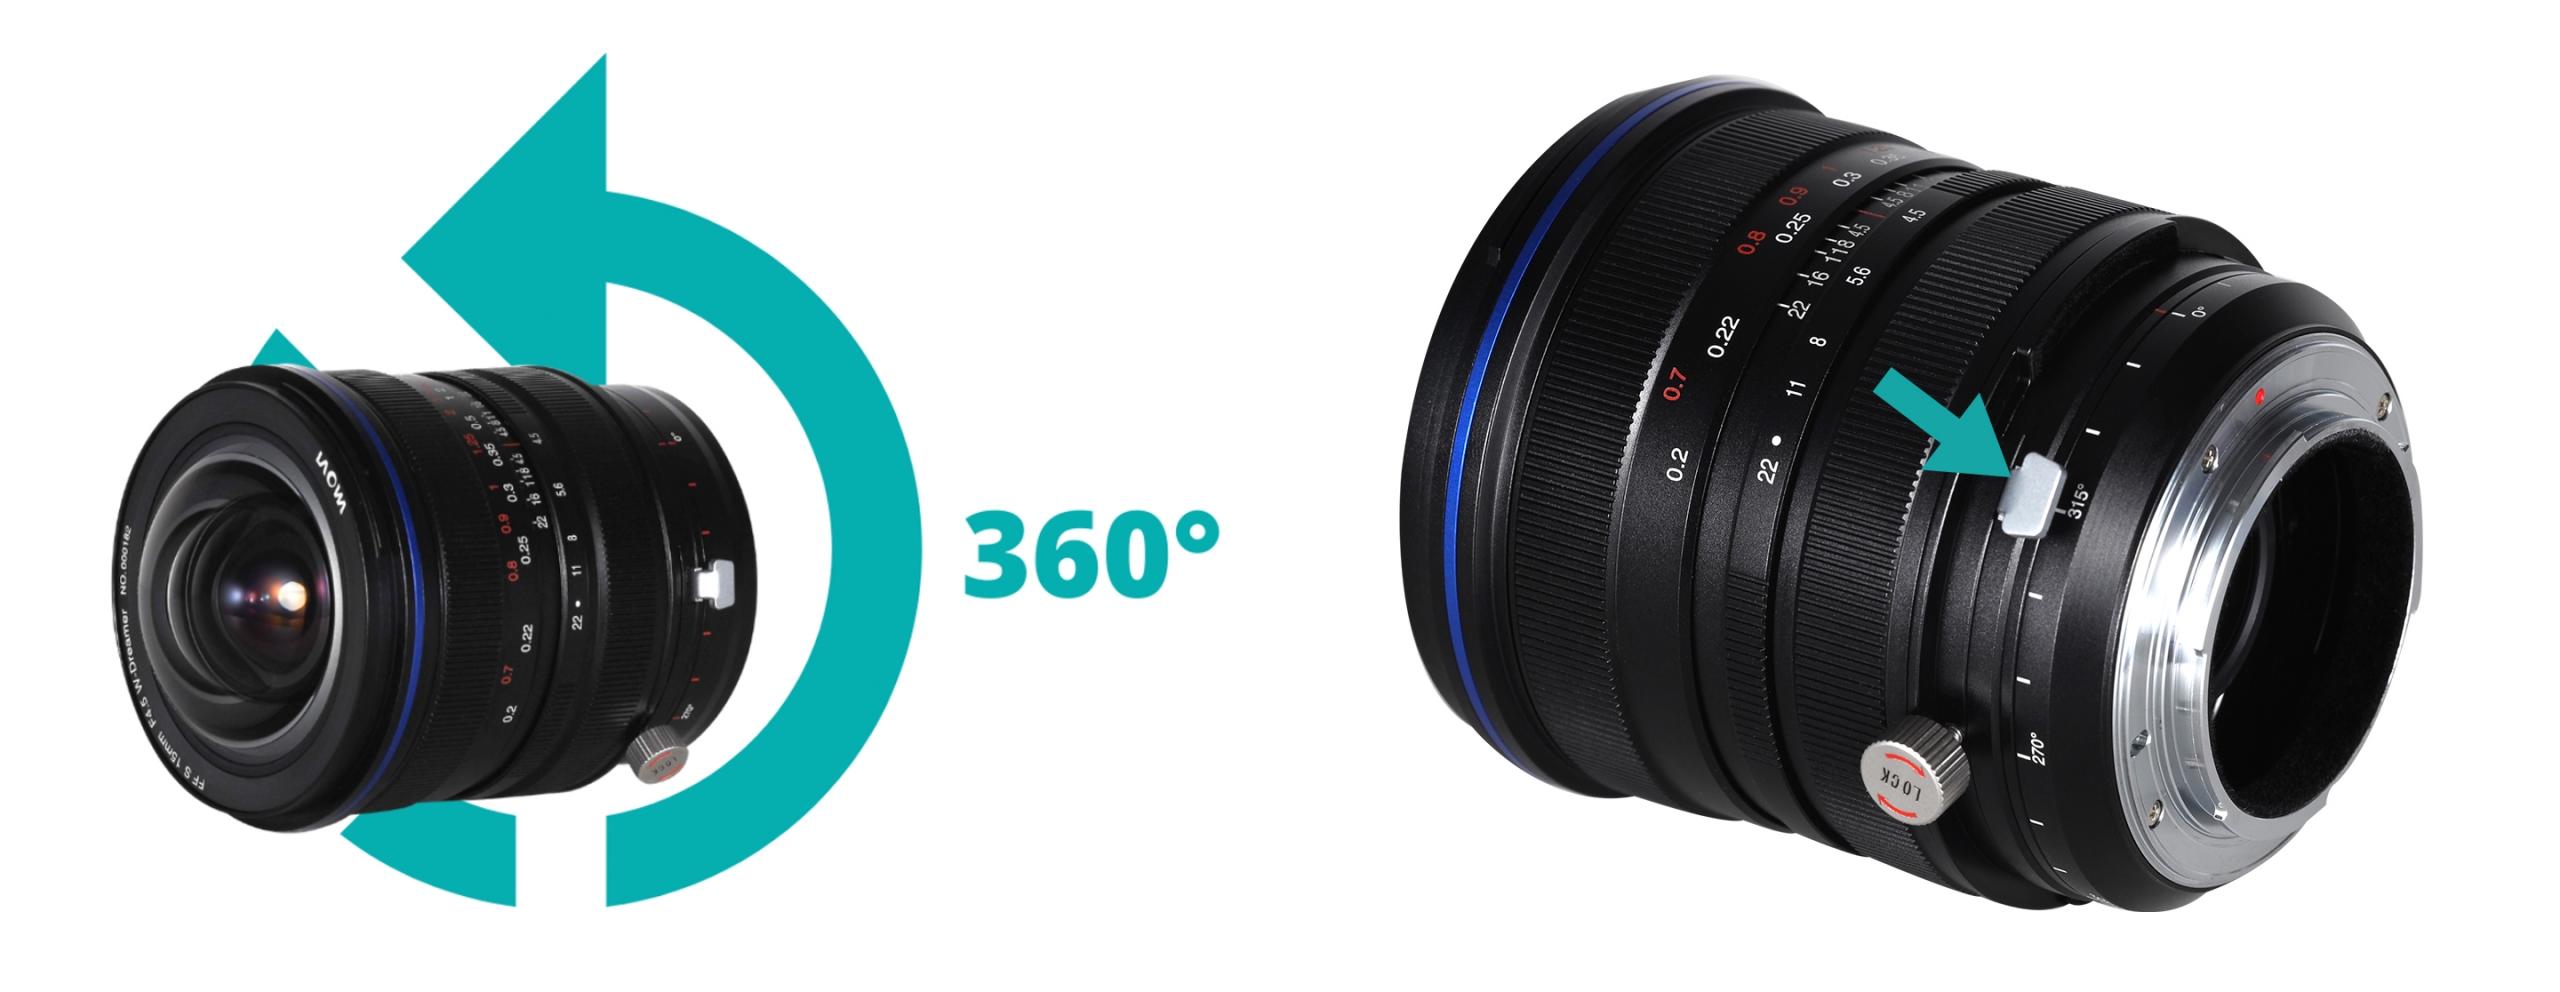 360 degrès